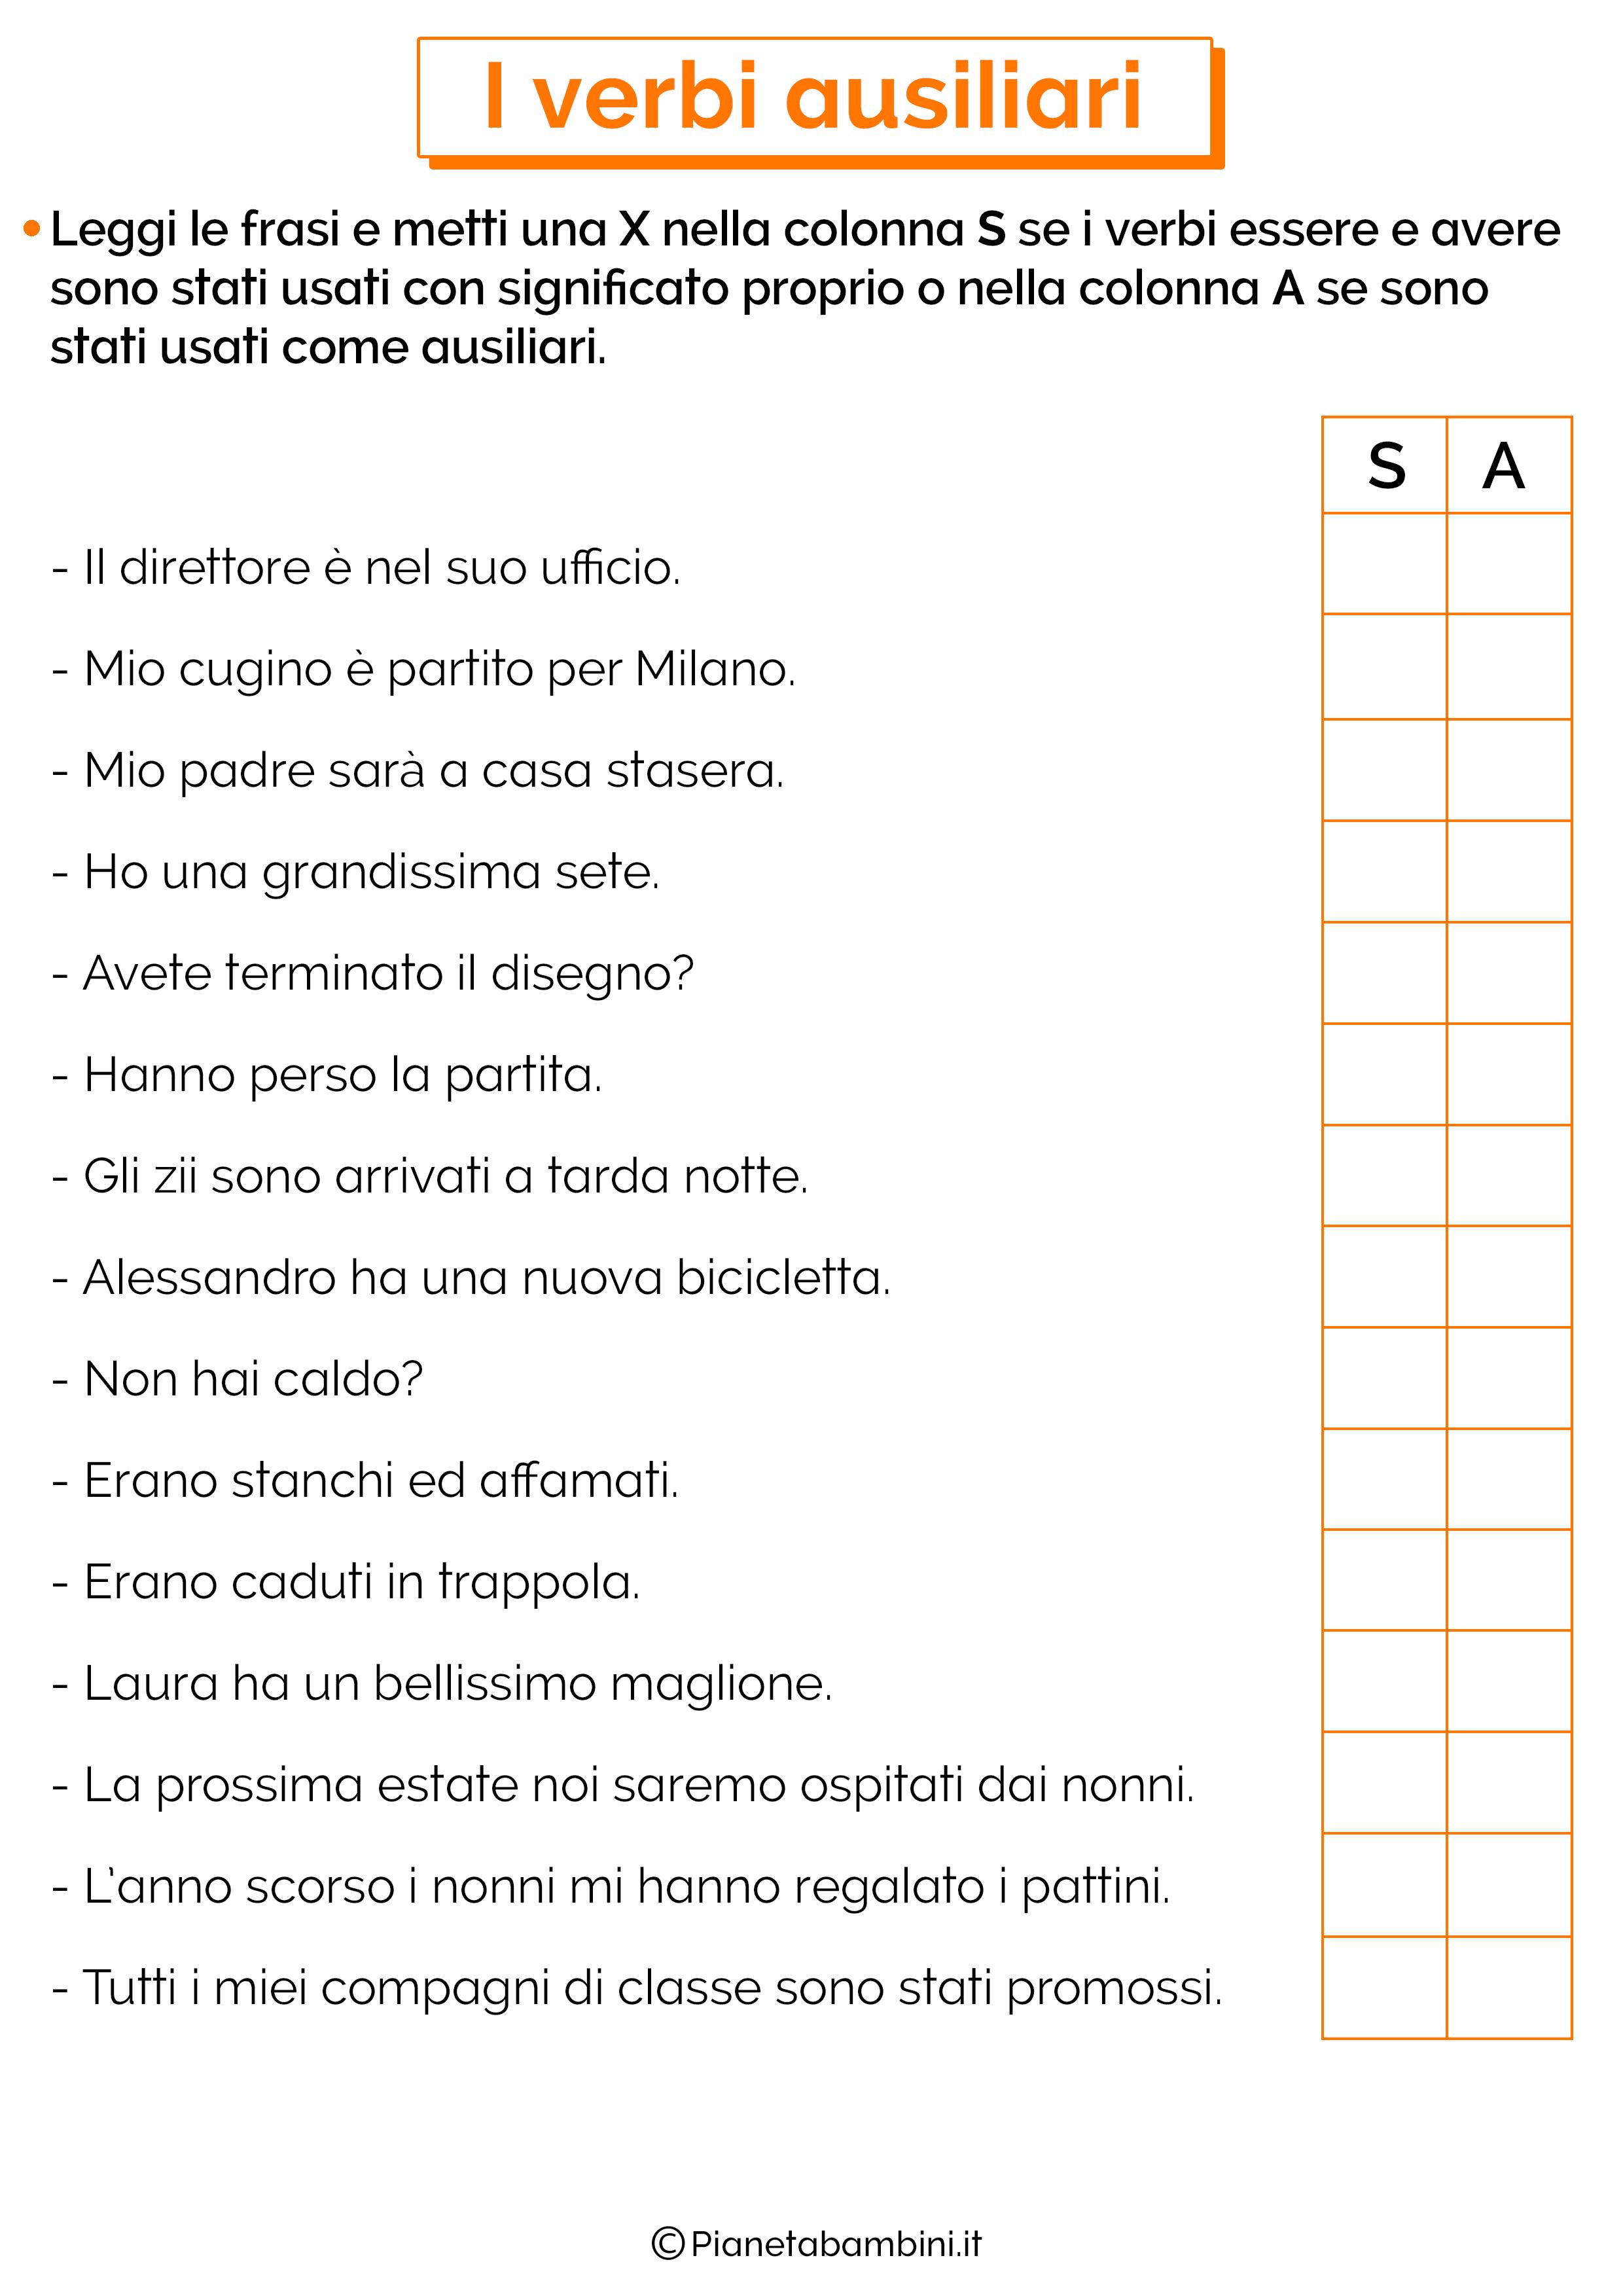 Esercizi sui verbi ausiliari 2